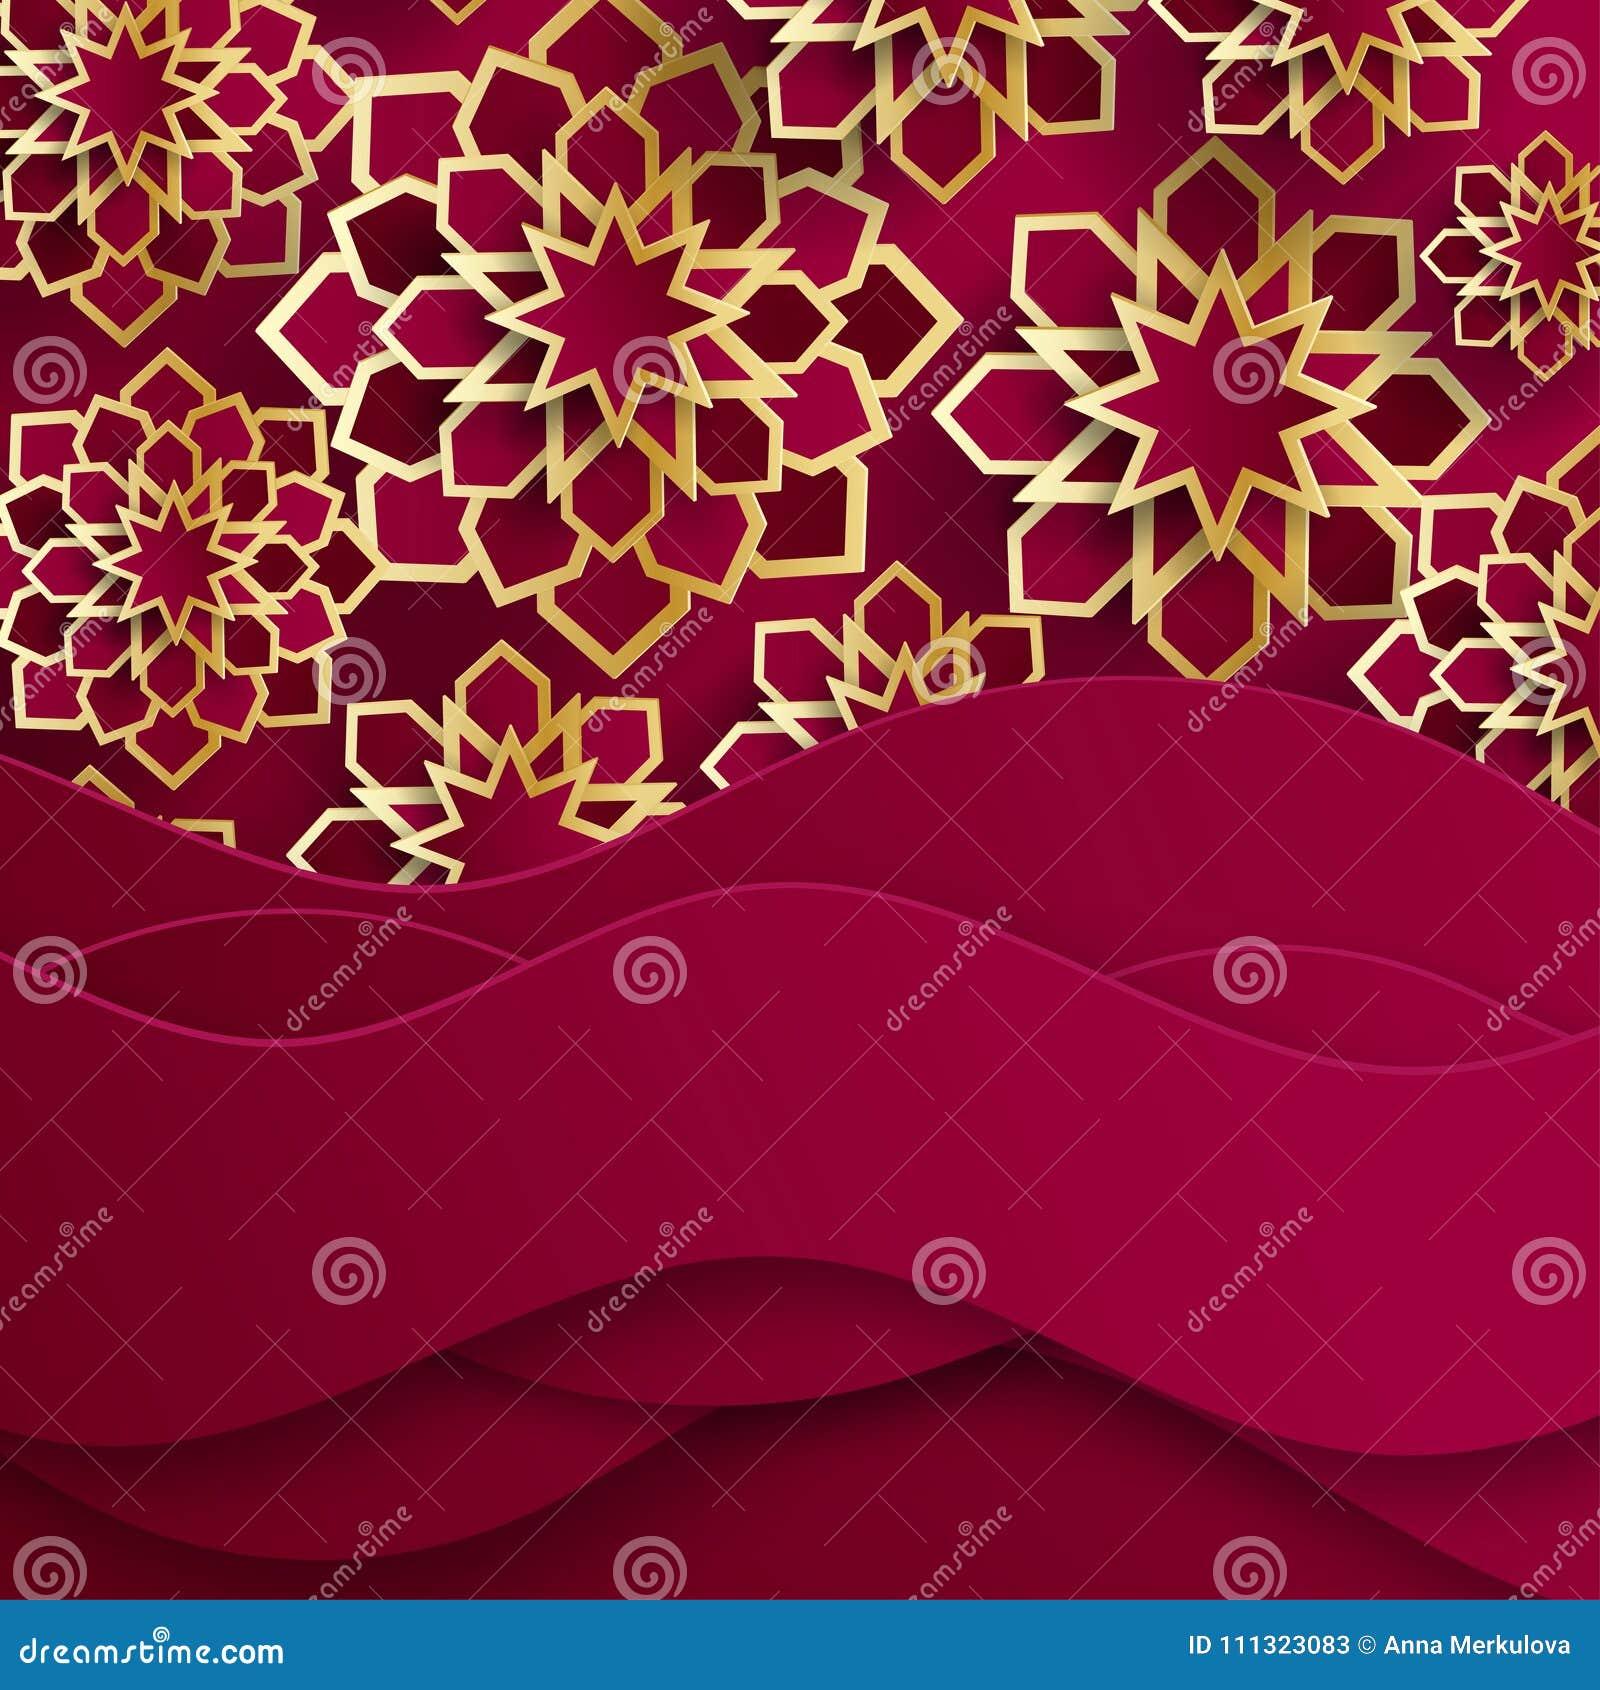 Ramadan kareem greeting card with arabic origami paper stars stock ramadan kareem greeting card with arabic origami paper stars m4hsunfo